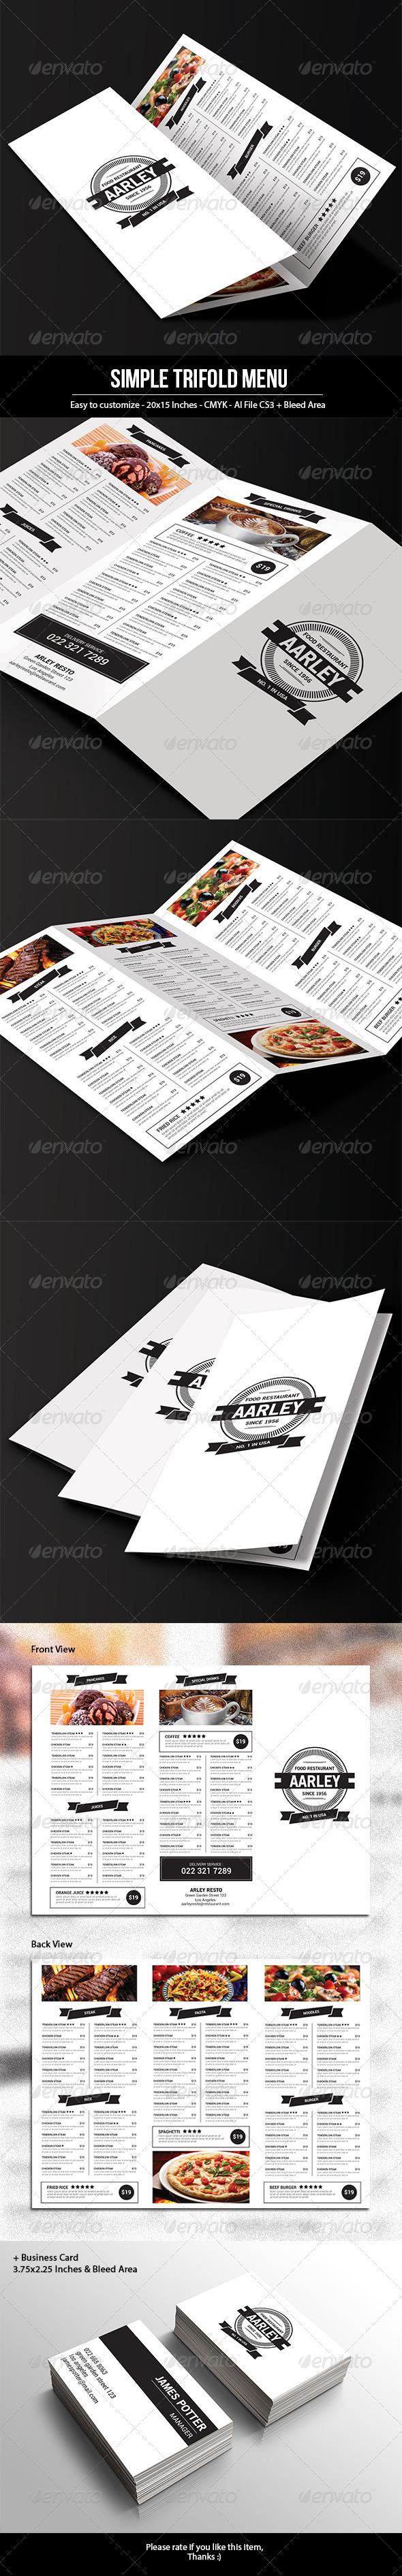 GraphicRiver Simple Trifold Menu 7769853